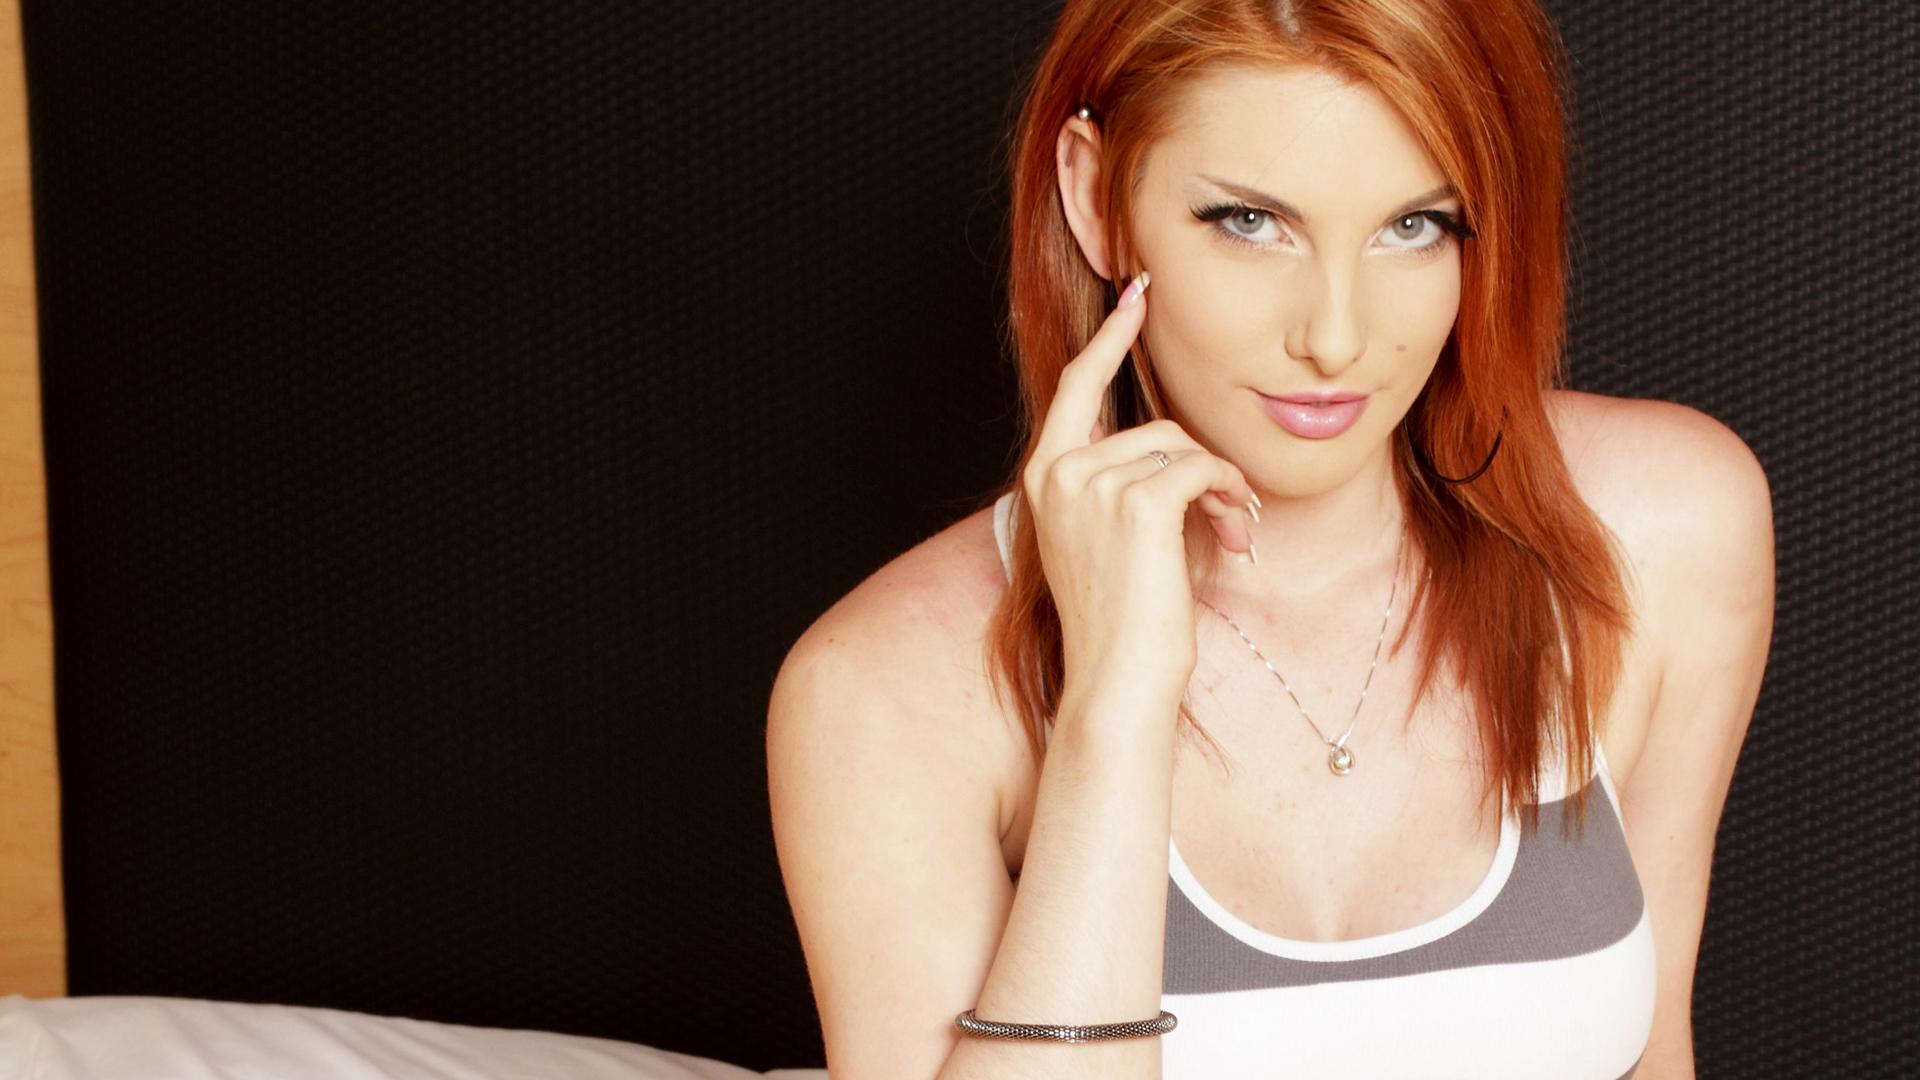 Wallpaper : Rainia Belle, redhead, pornstar, women